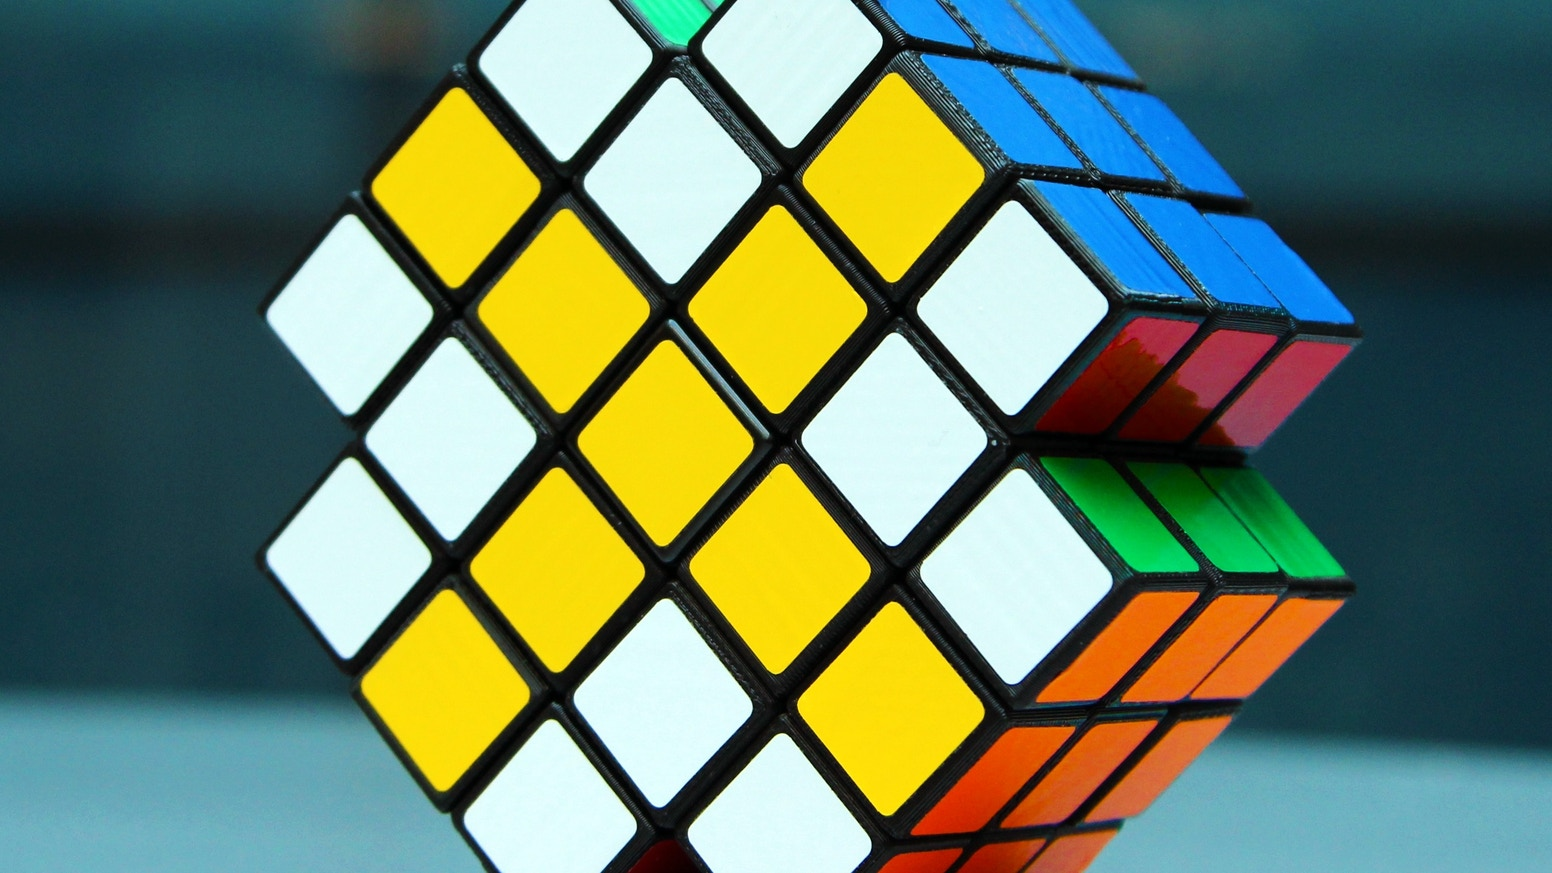 The neXt generation, shape-shifting, 3D logic puzzle.